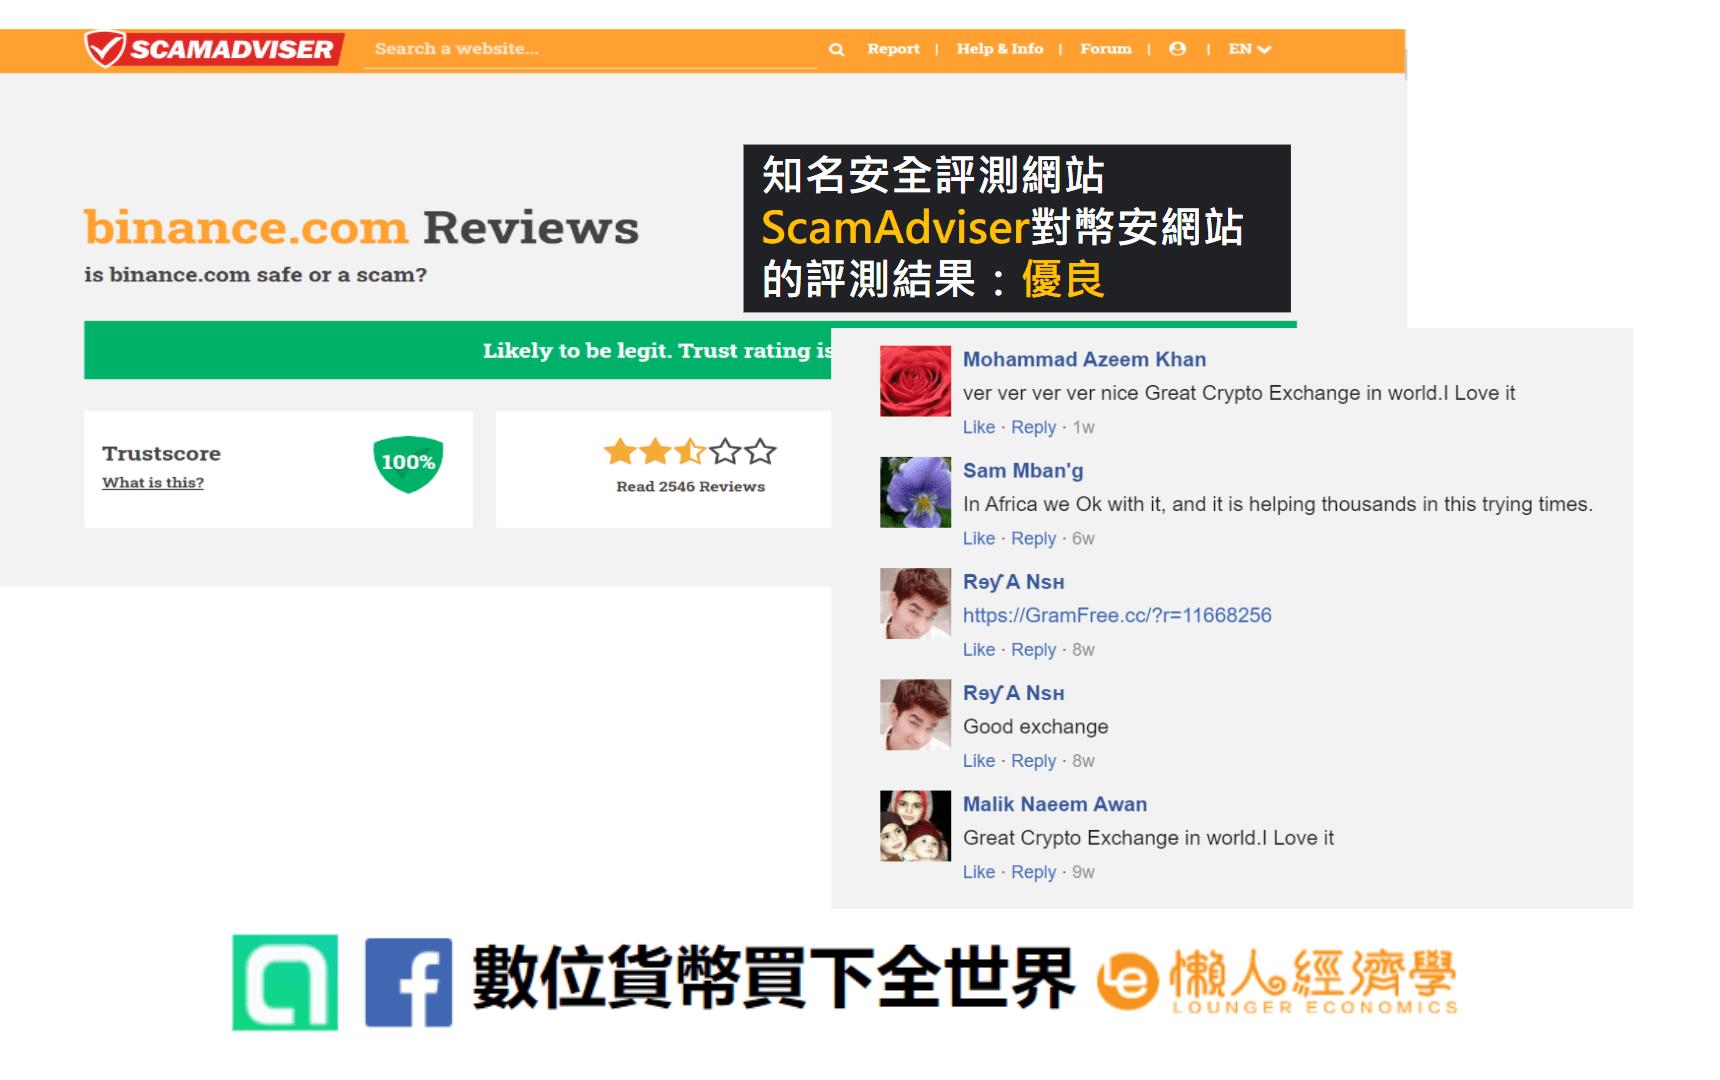 ScamAdviser網站對幣安評價